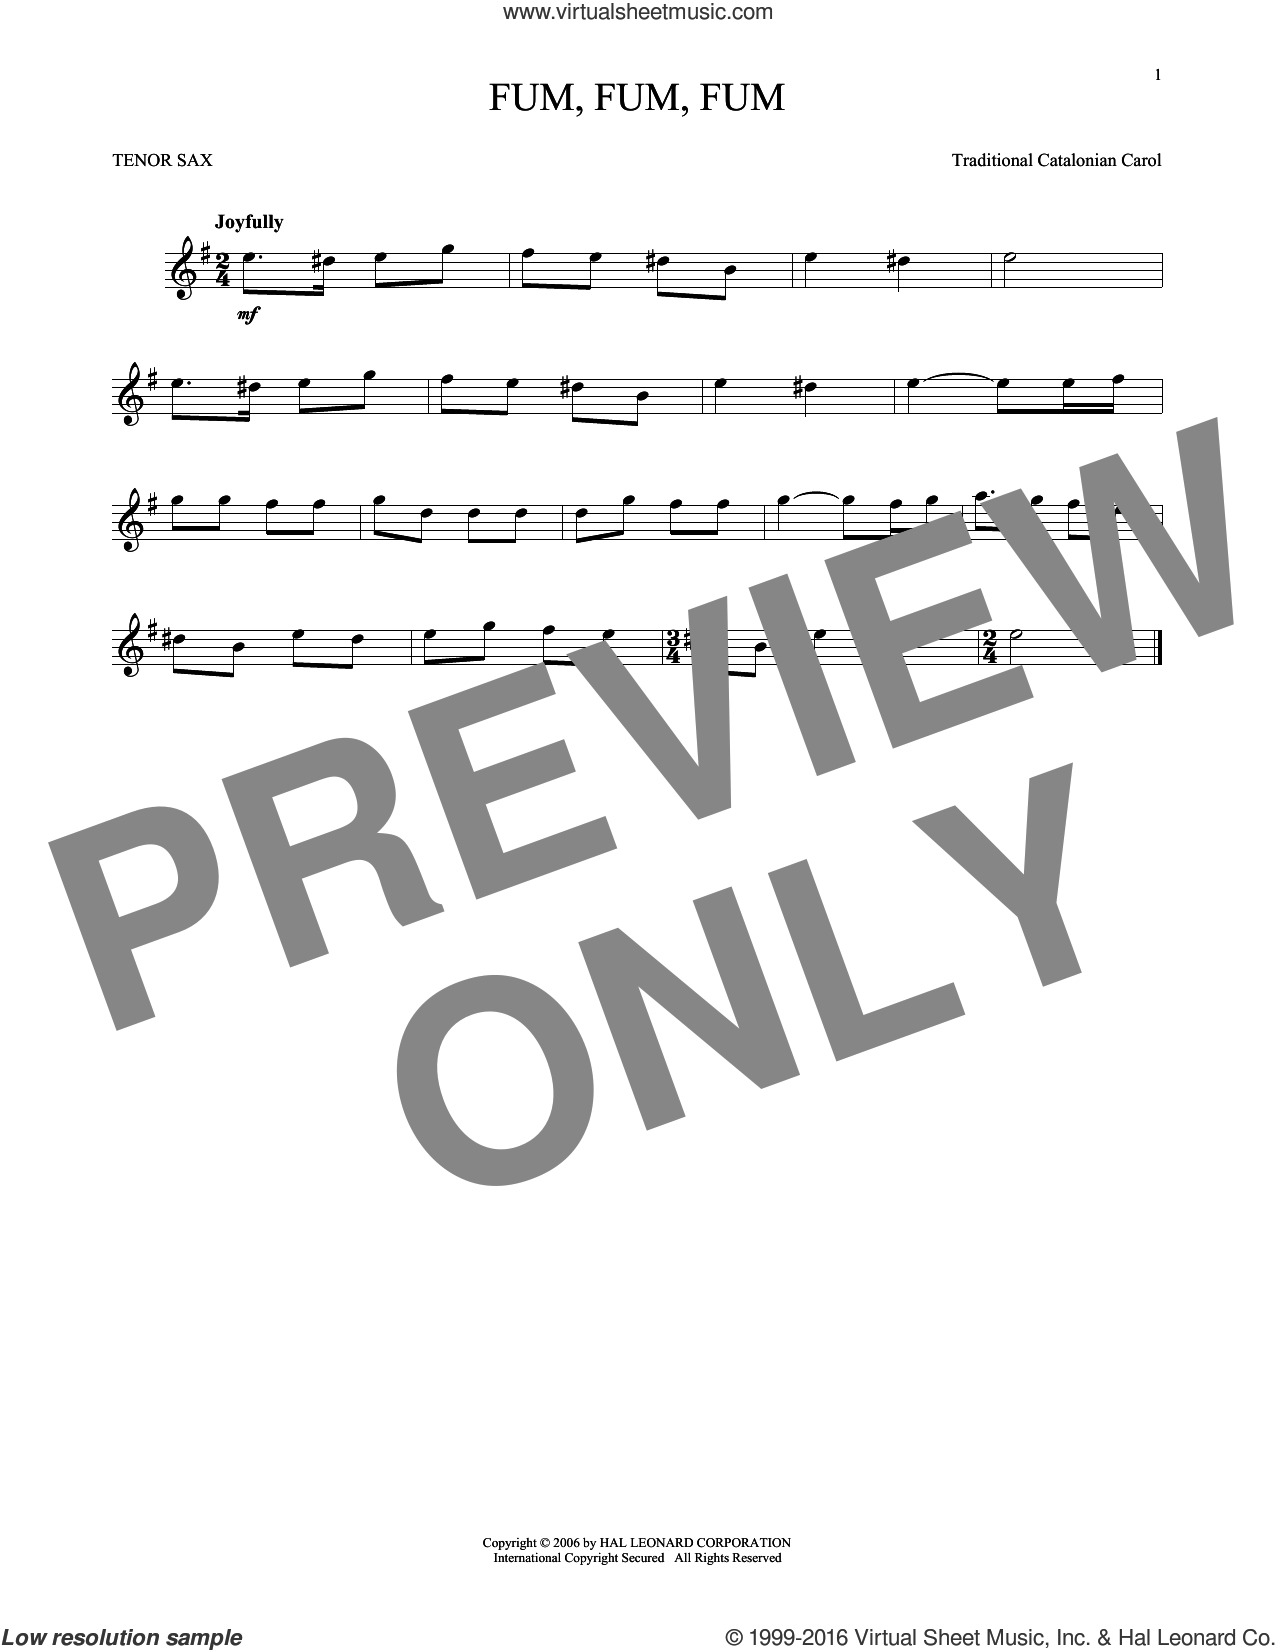 Fum, Fum, Fum sheet music for tenor saxophone solo, intermediate skill level